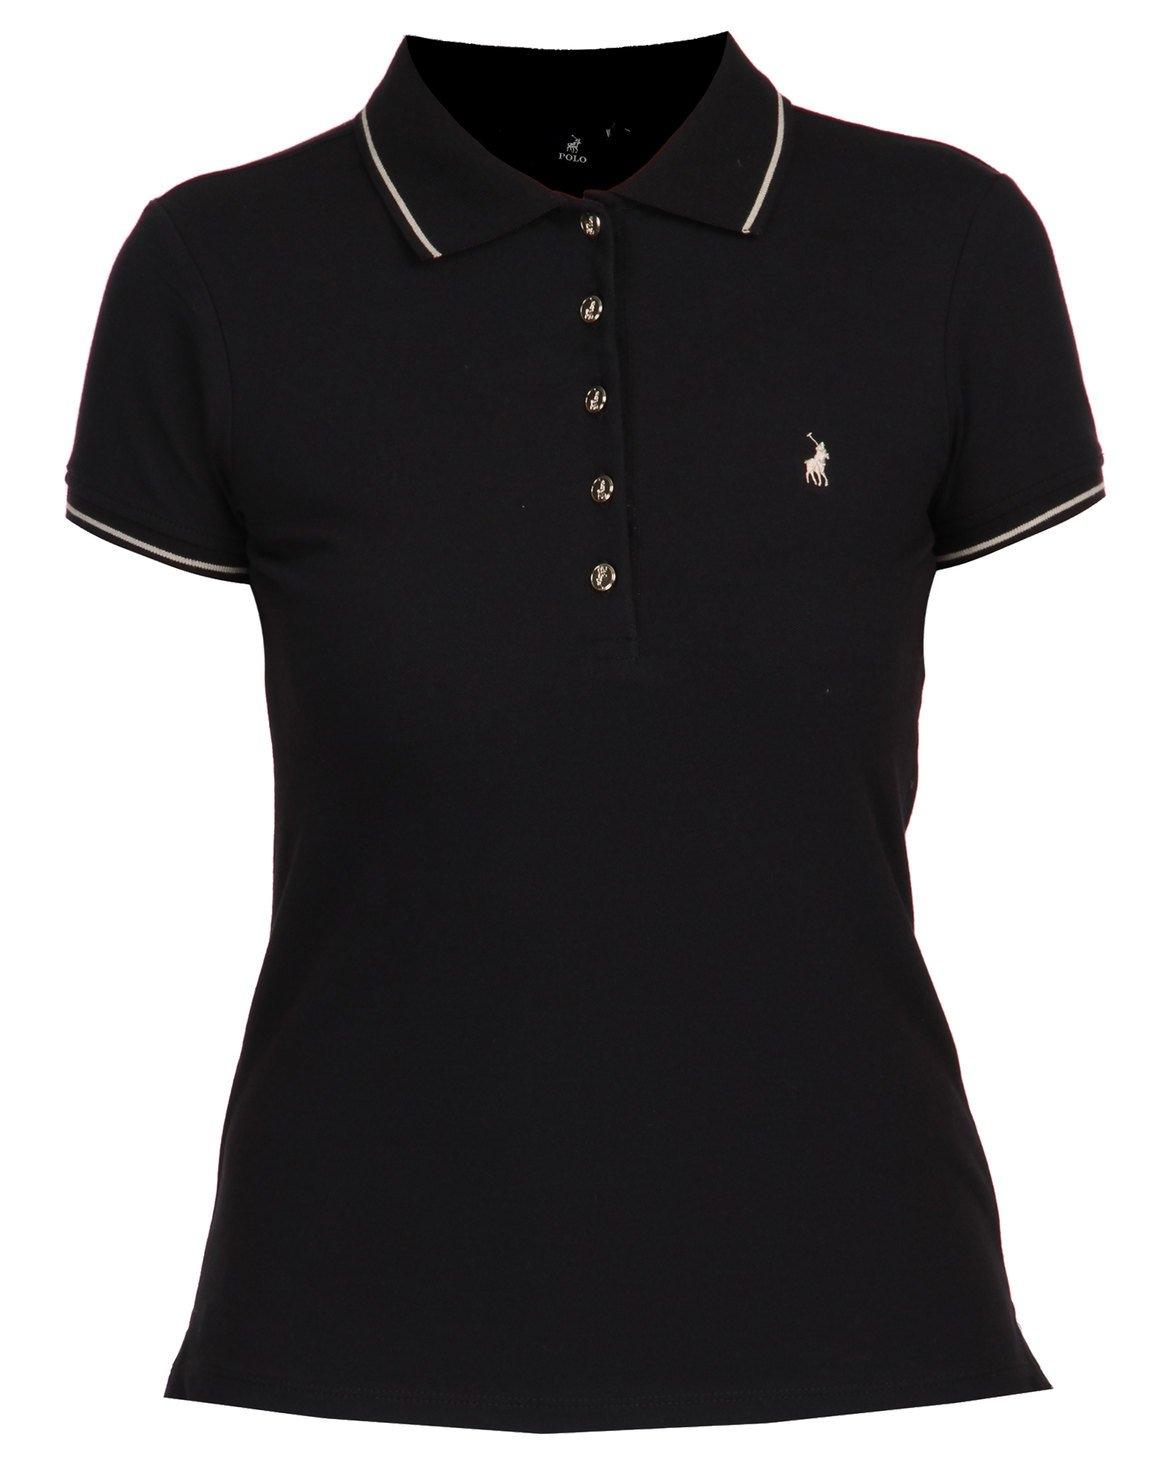 Polo Charlie Short Sleeve Gold Button Stretch Golfer Black – ZALEKA ... bb287d86b93e1